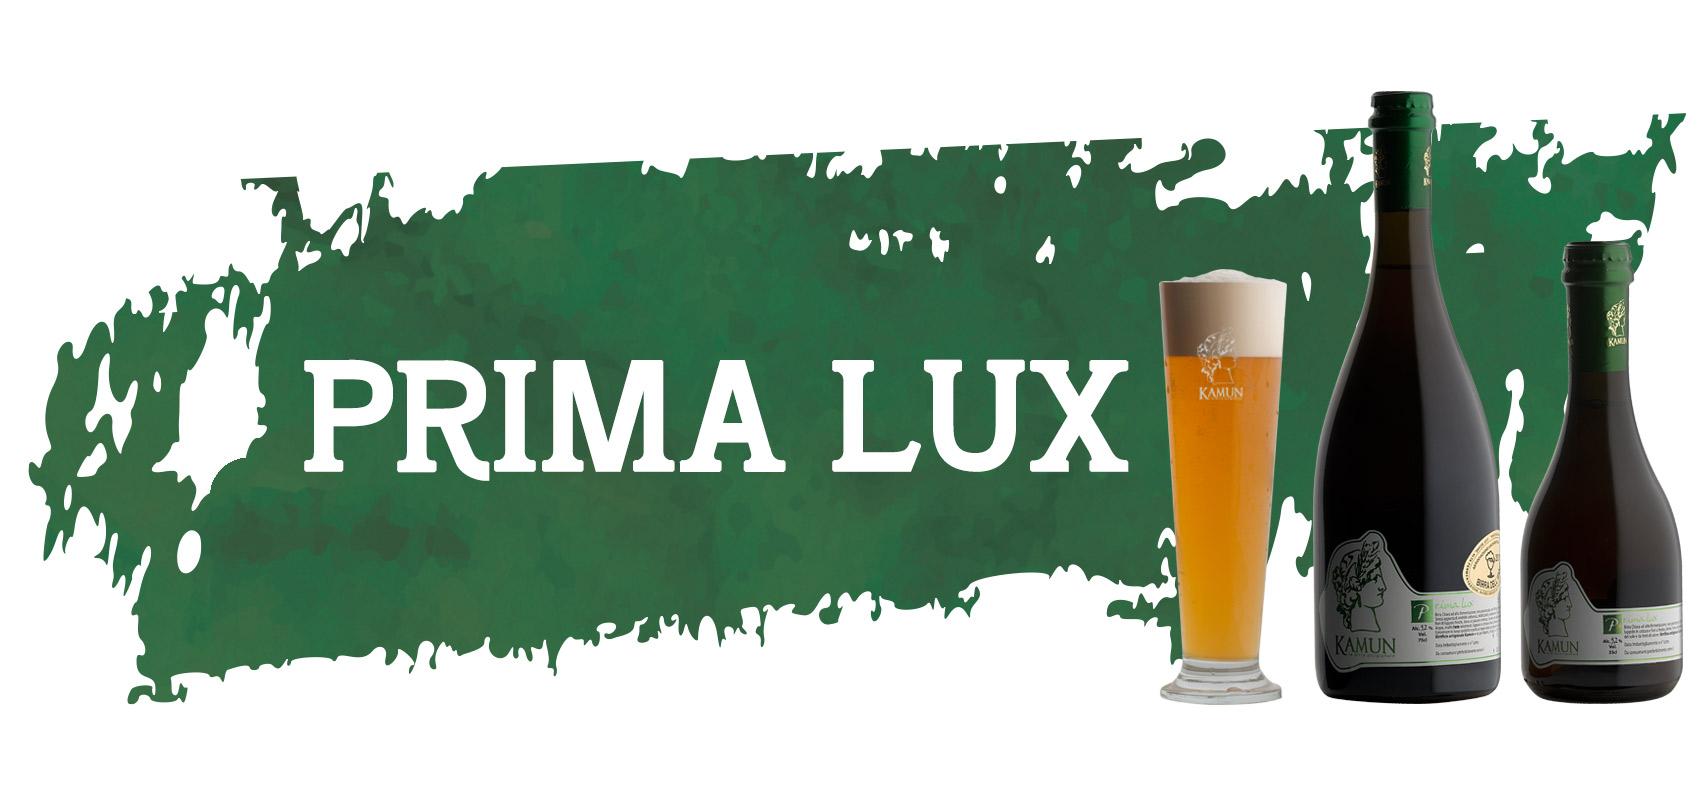 prima-lux-schiuma-new